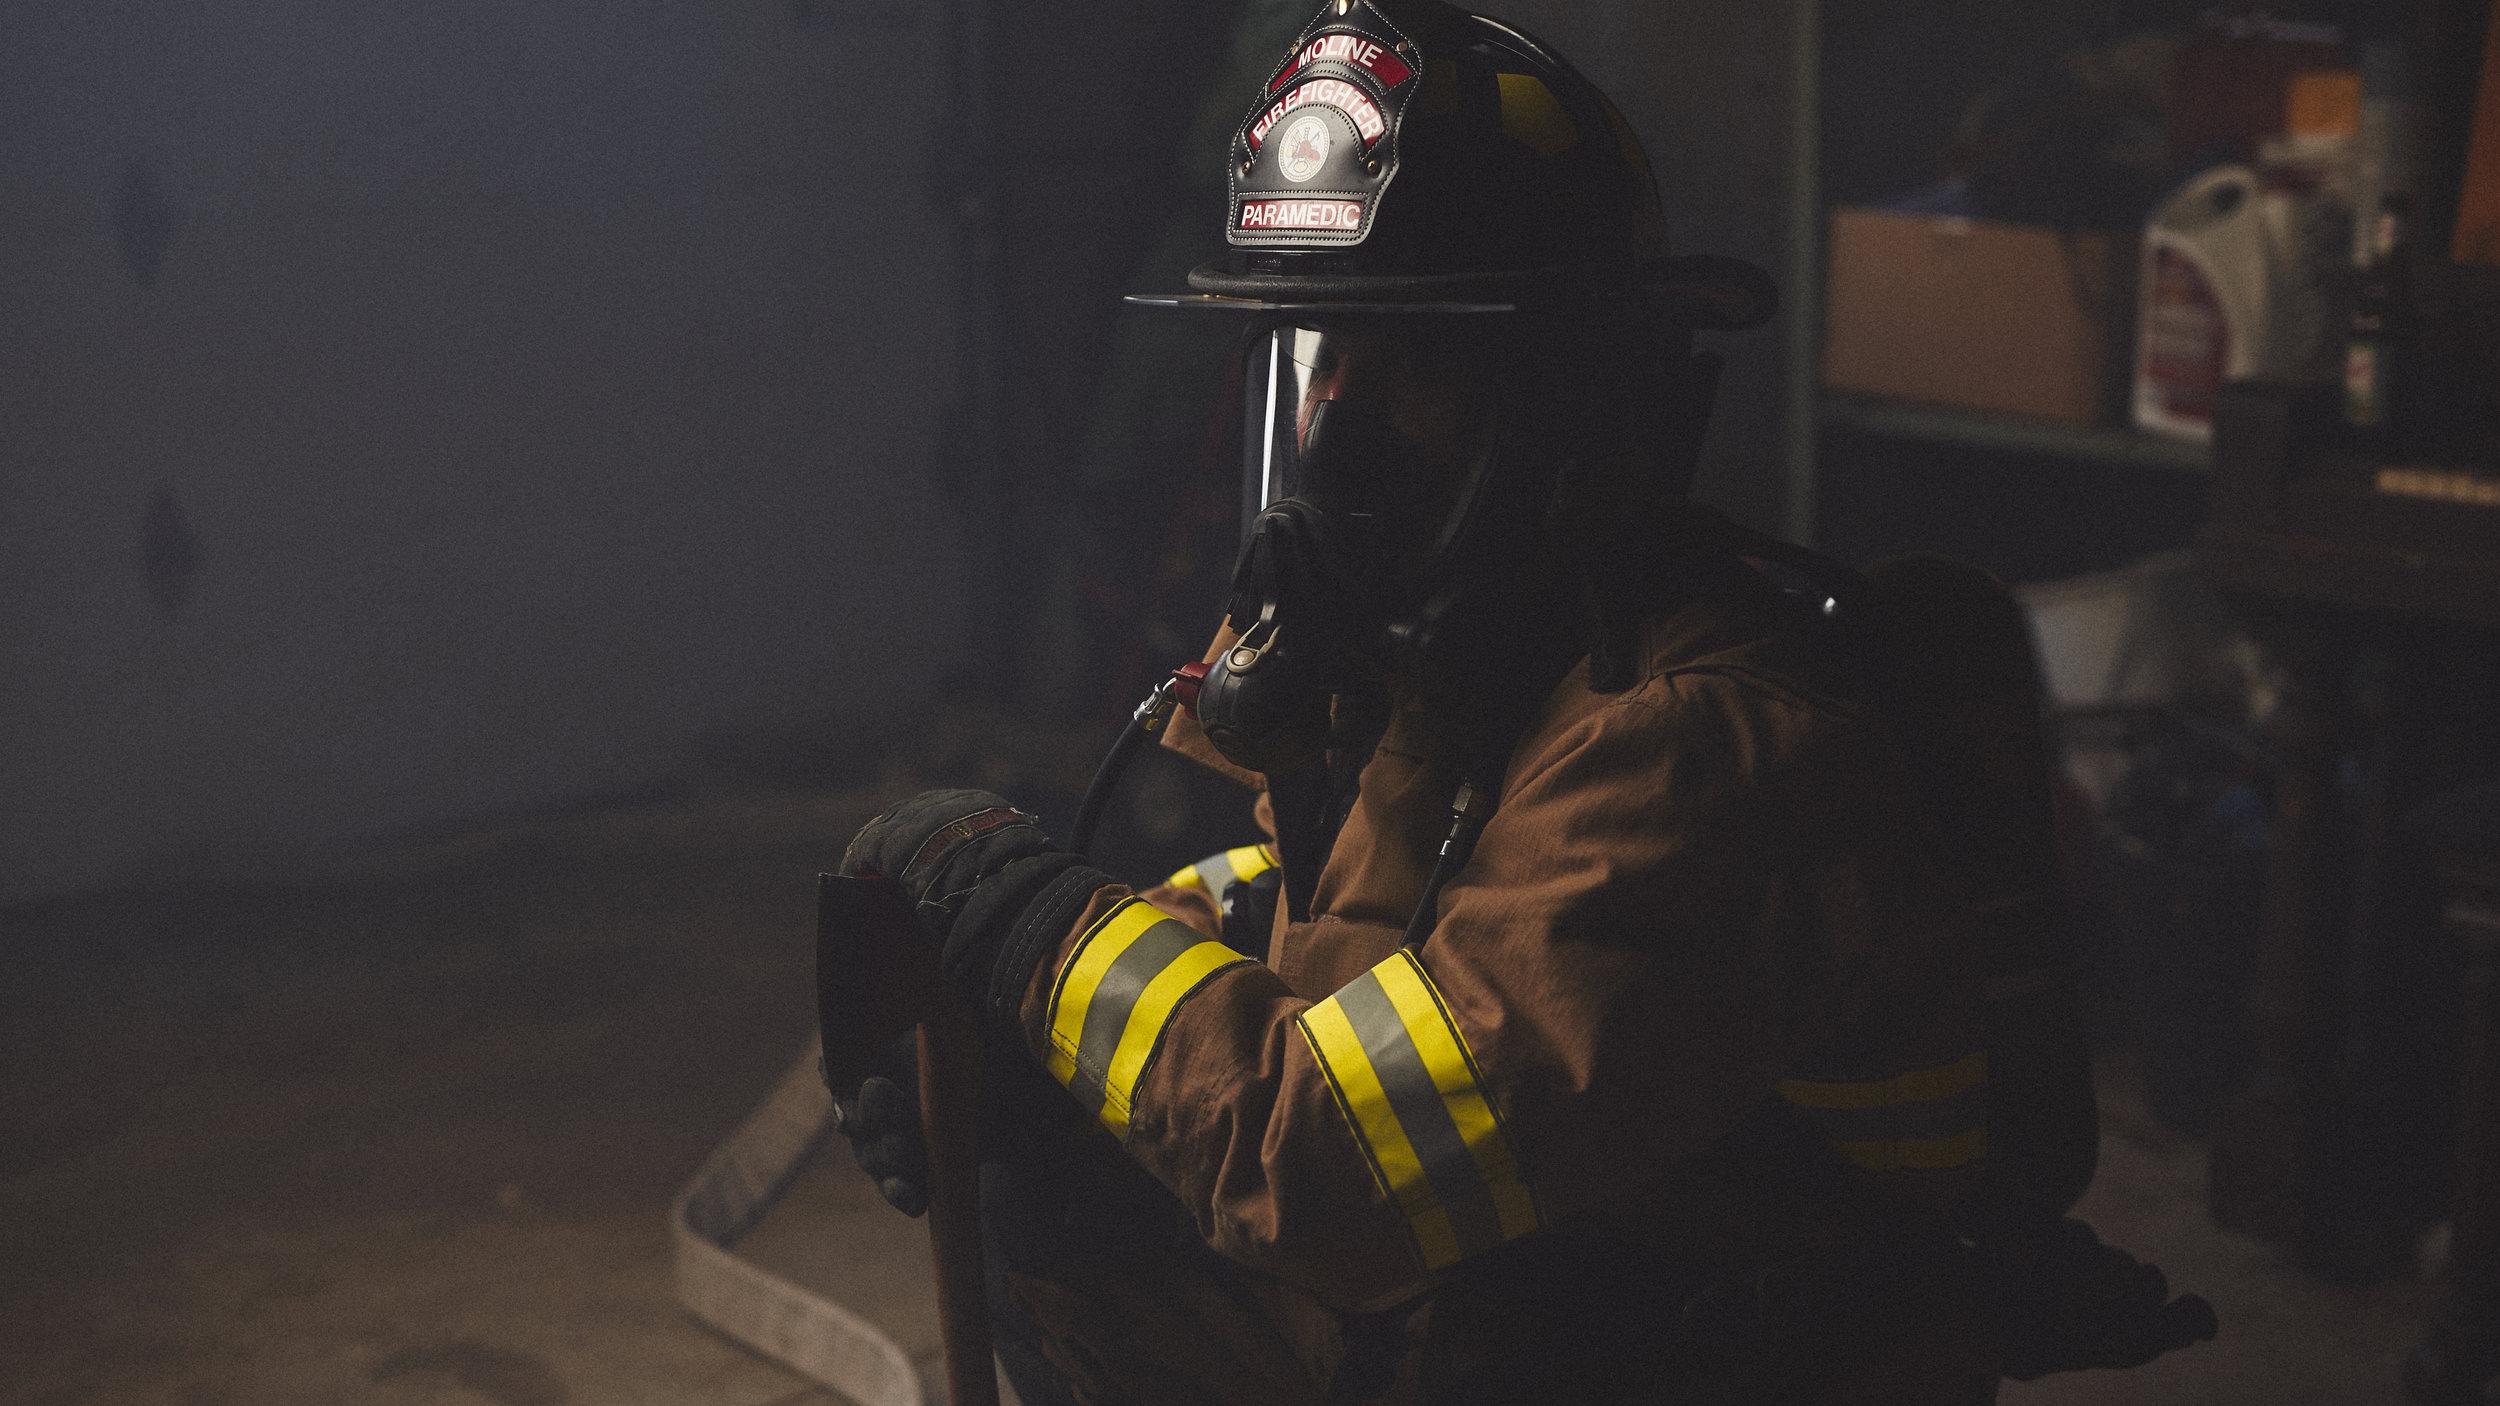 Illinois firefighter portrait with studio lights